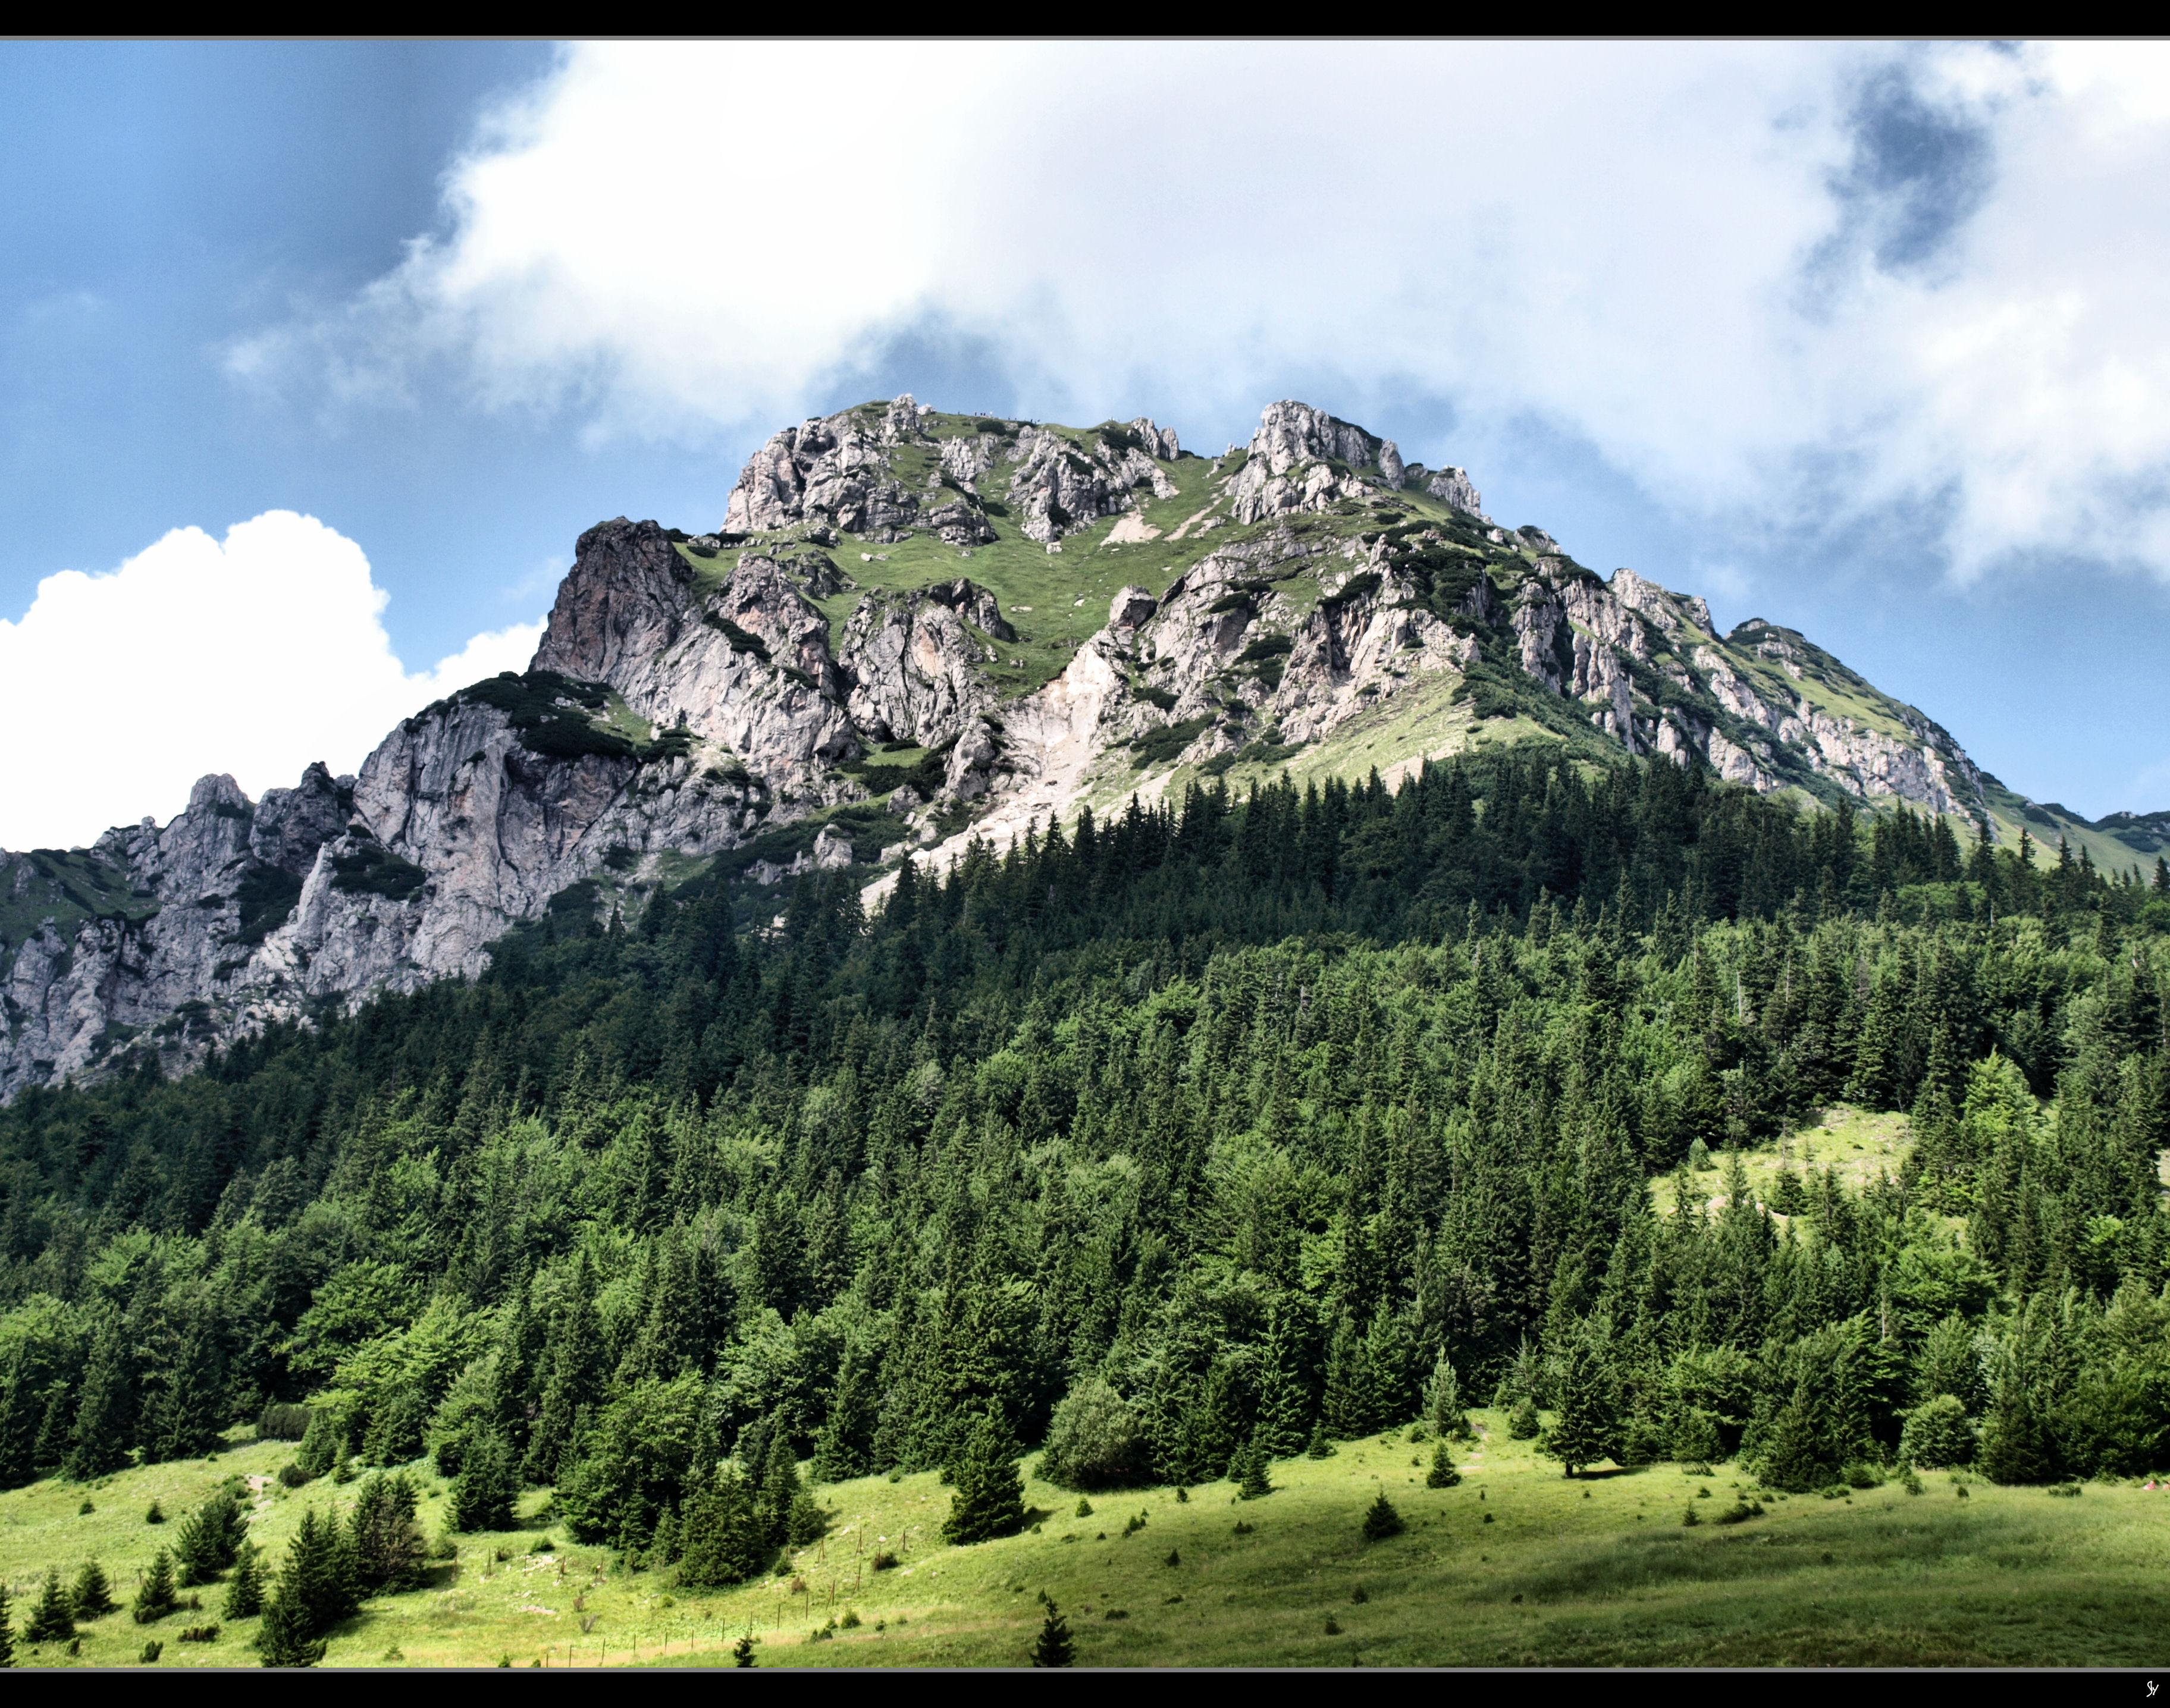 Mountains Landscape Gory E510 Malafatra Krajobraz Vratna S Owacja Olympuse510 Landscapesdreams